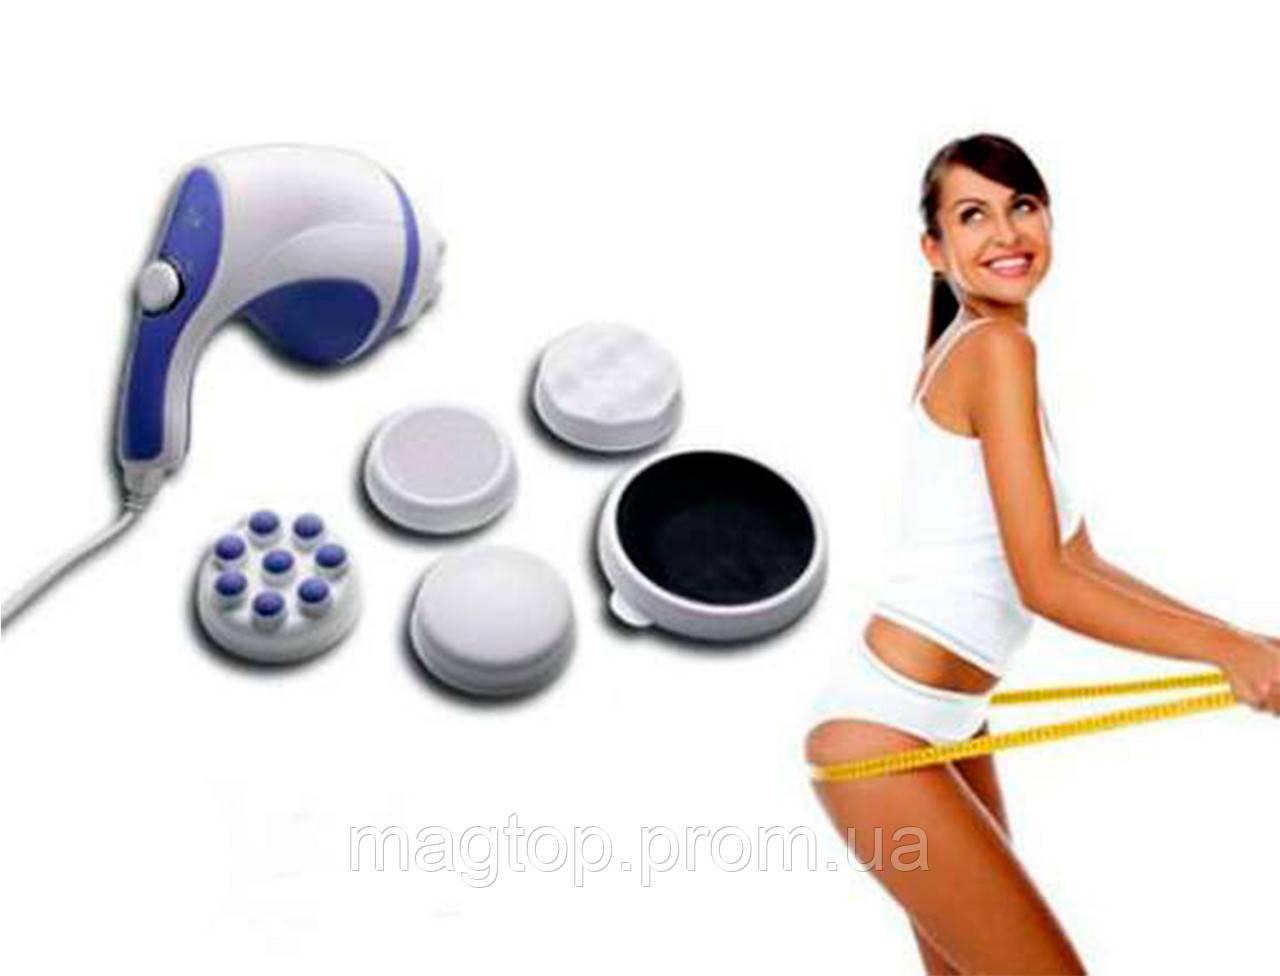 Электрический массажер для тела. Электромассажеры: инструкция, отзывы, цены 28